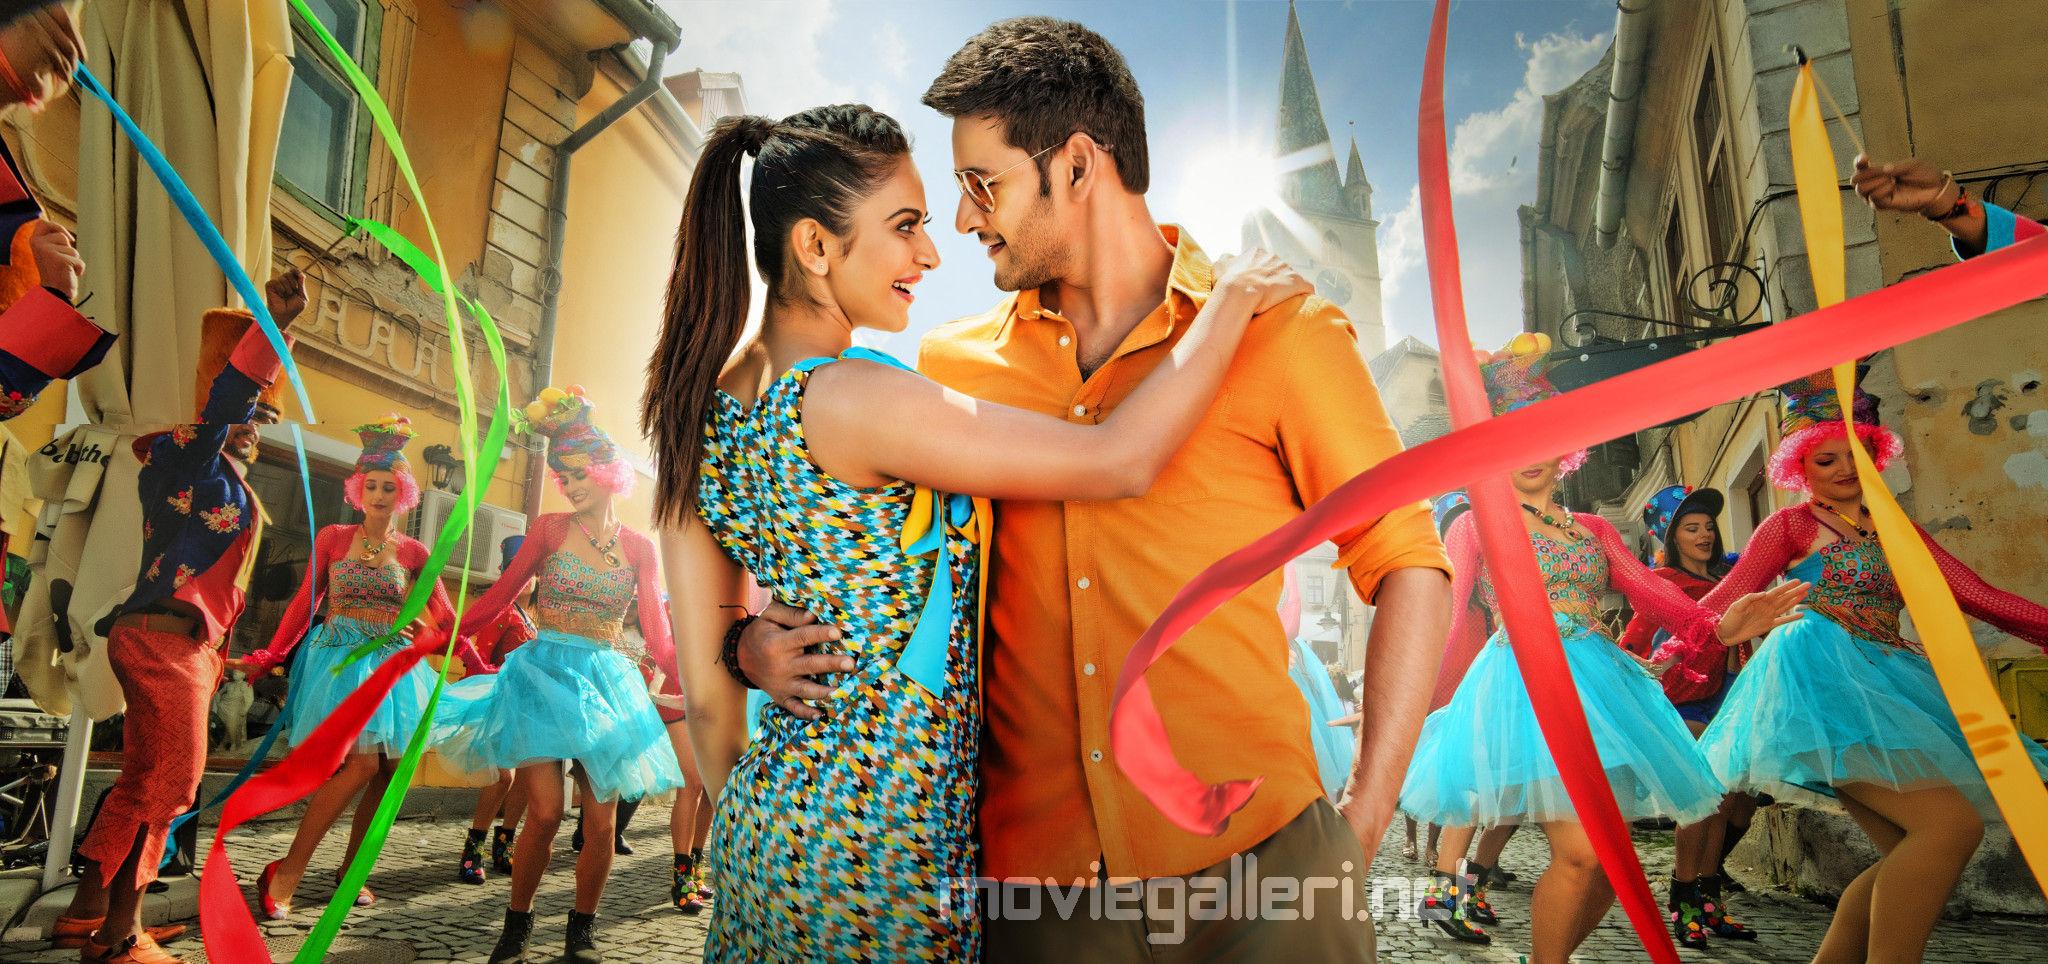 Mahesh Babu Rakul Preet Spyder Movie Review Rating